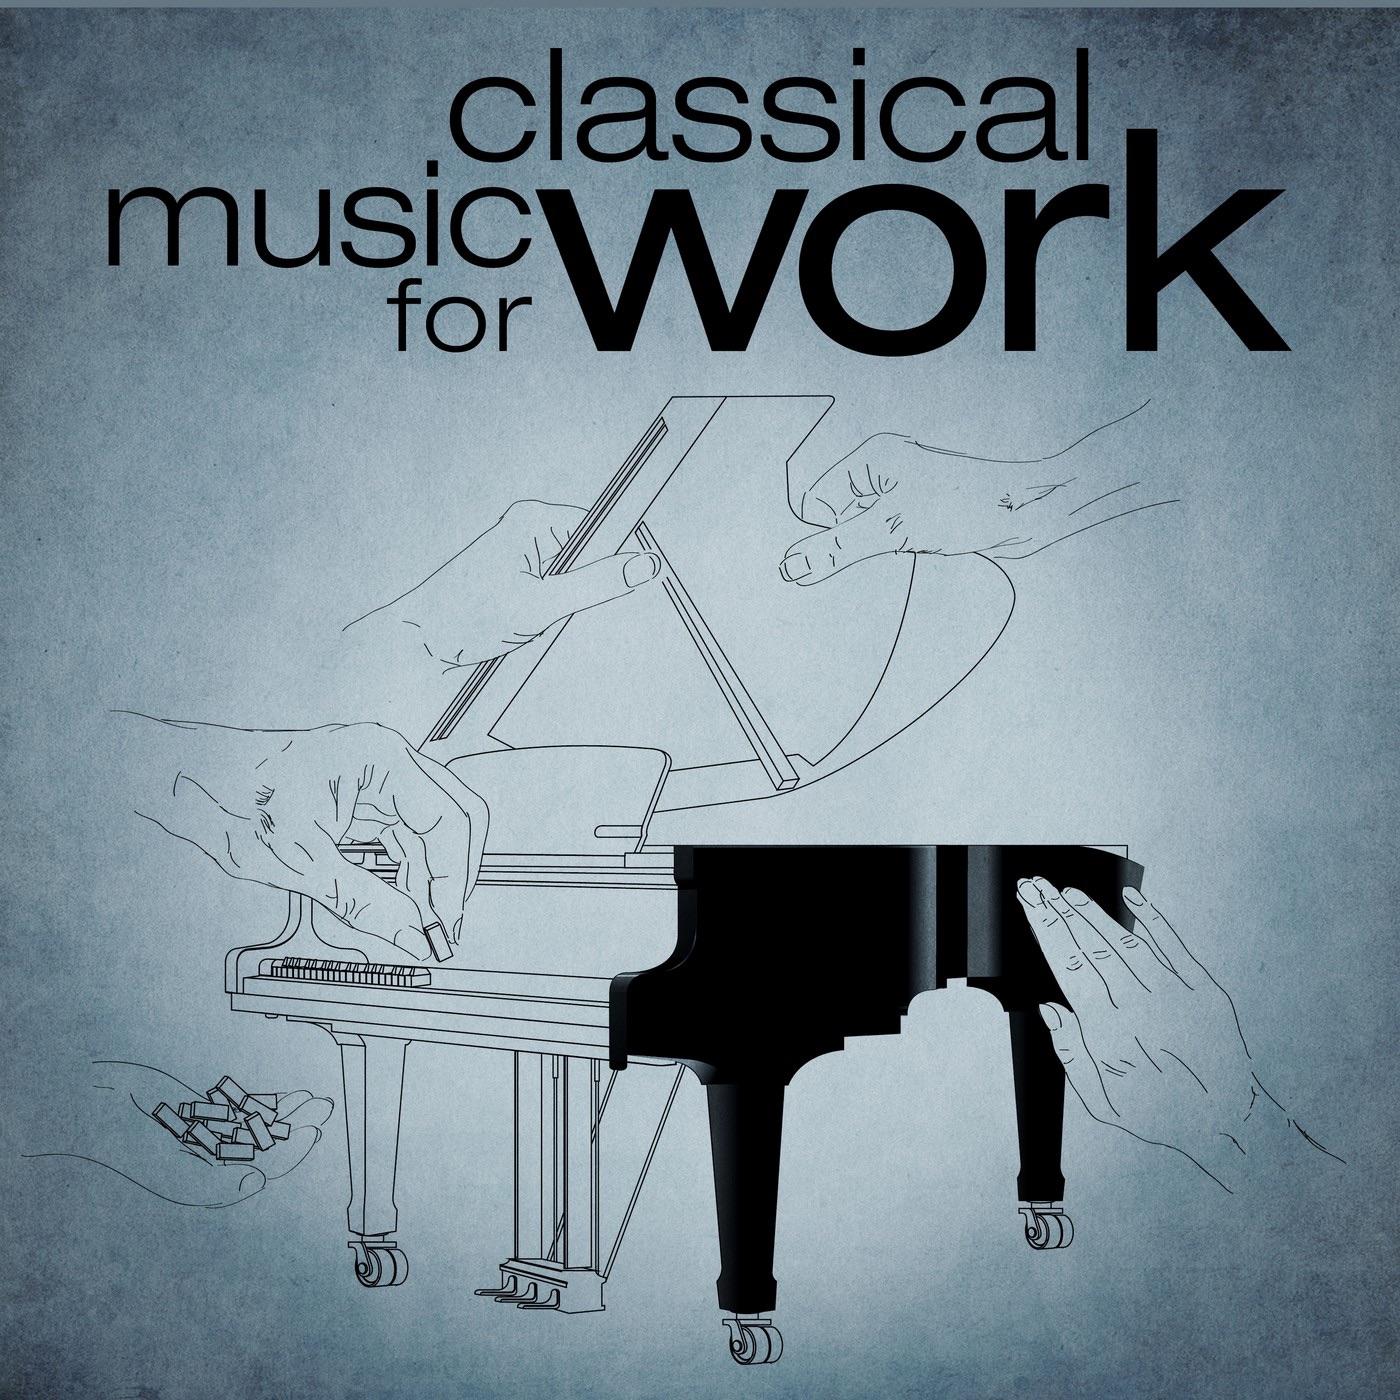 Symphony No. 6 in B Minor, Op. 74 'Pathétique': I. Adagio - Allegro con troppo